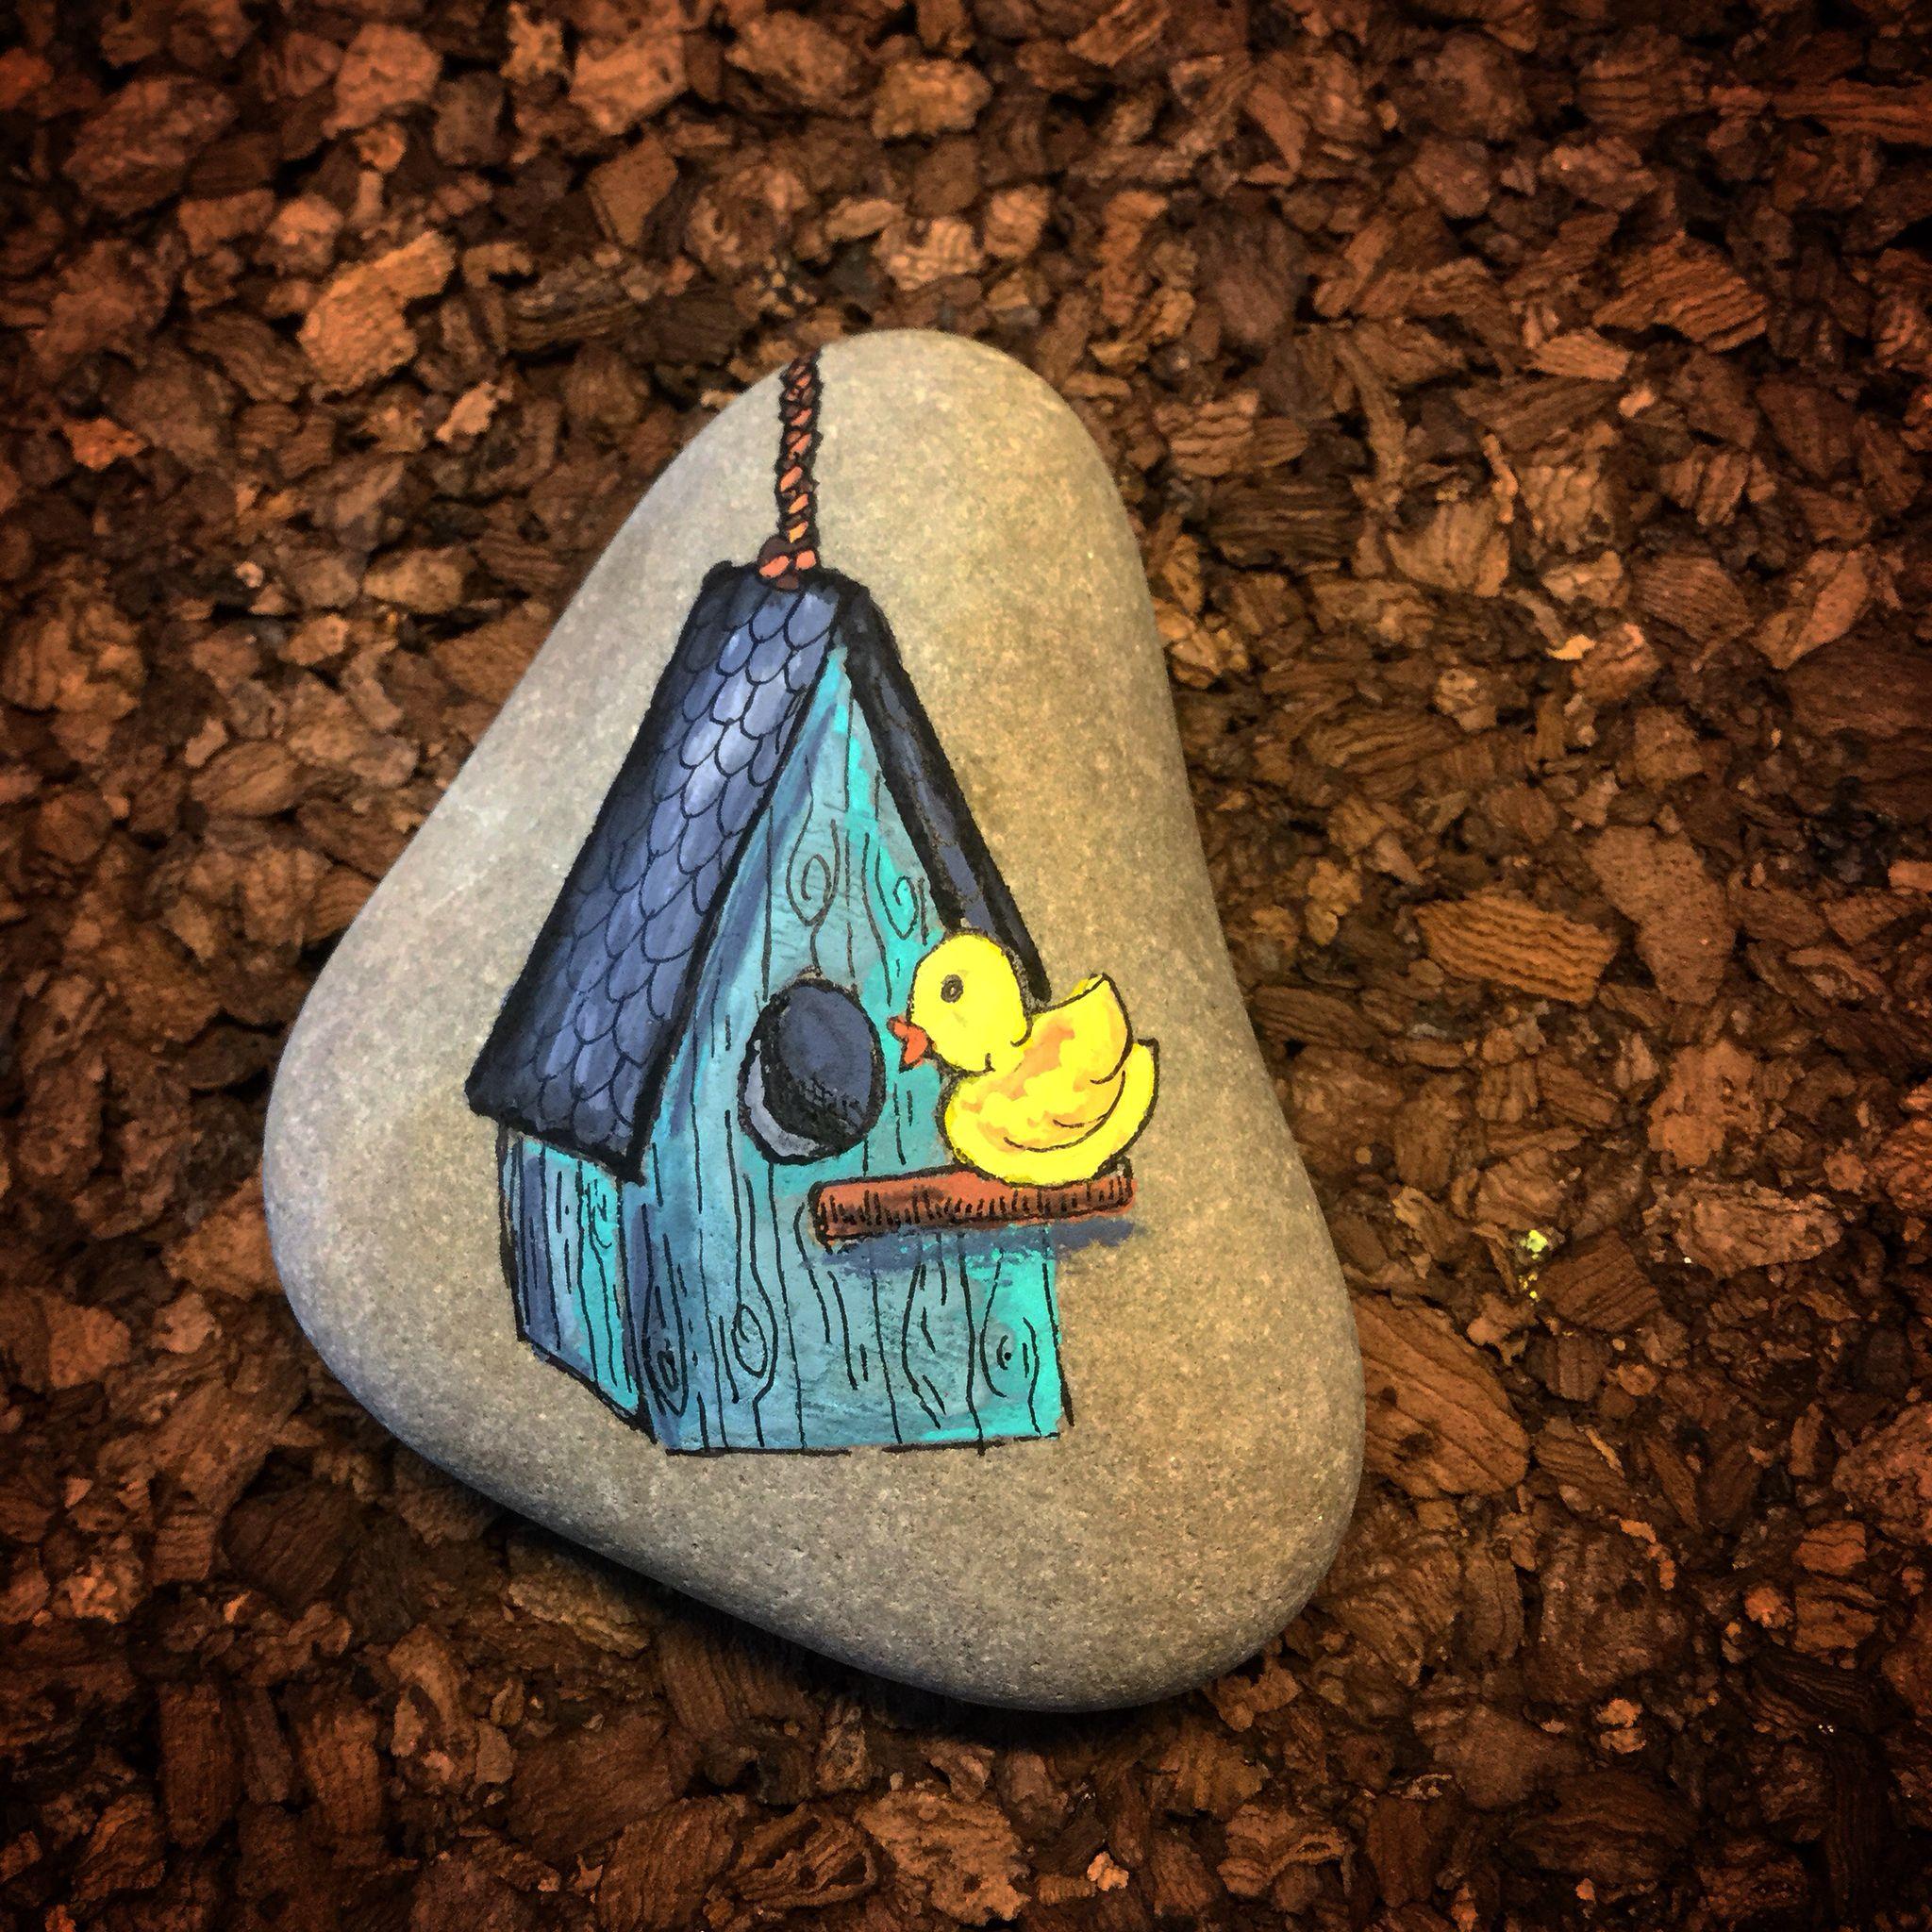 Birdhouse by lene mortensen painted rocks craft